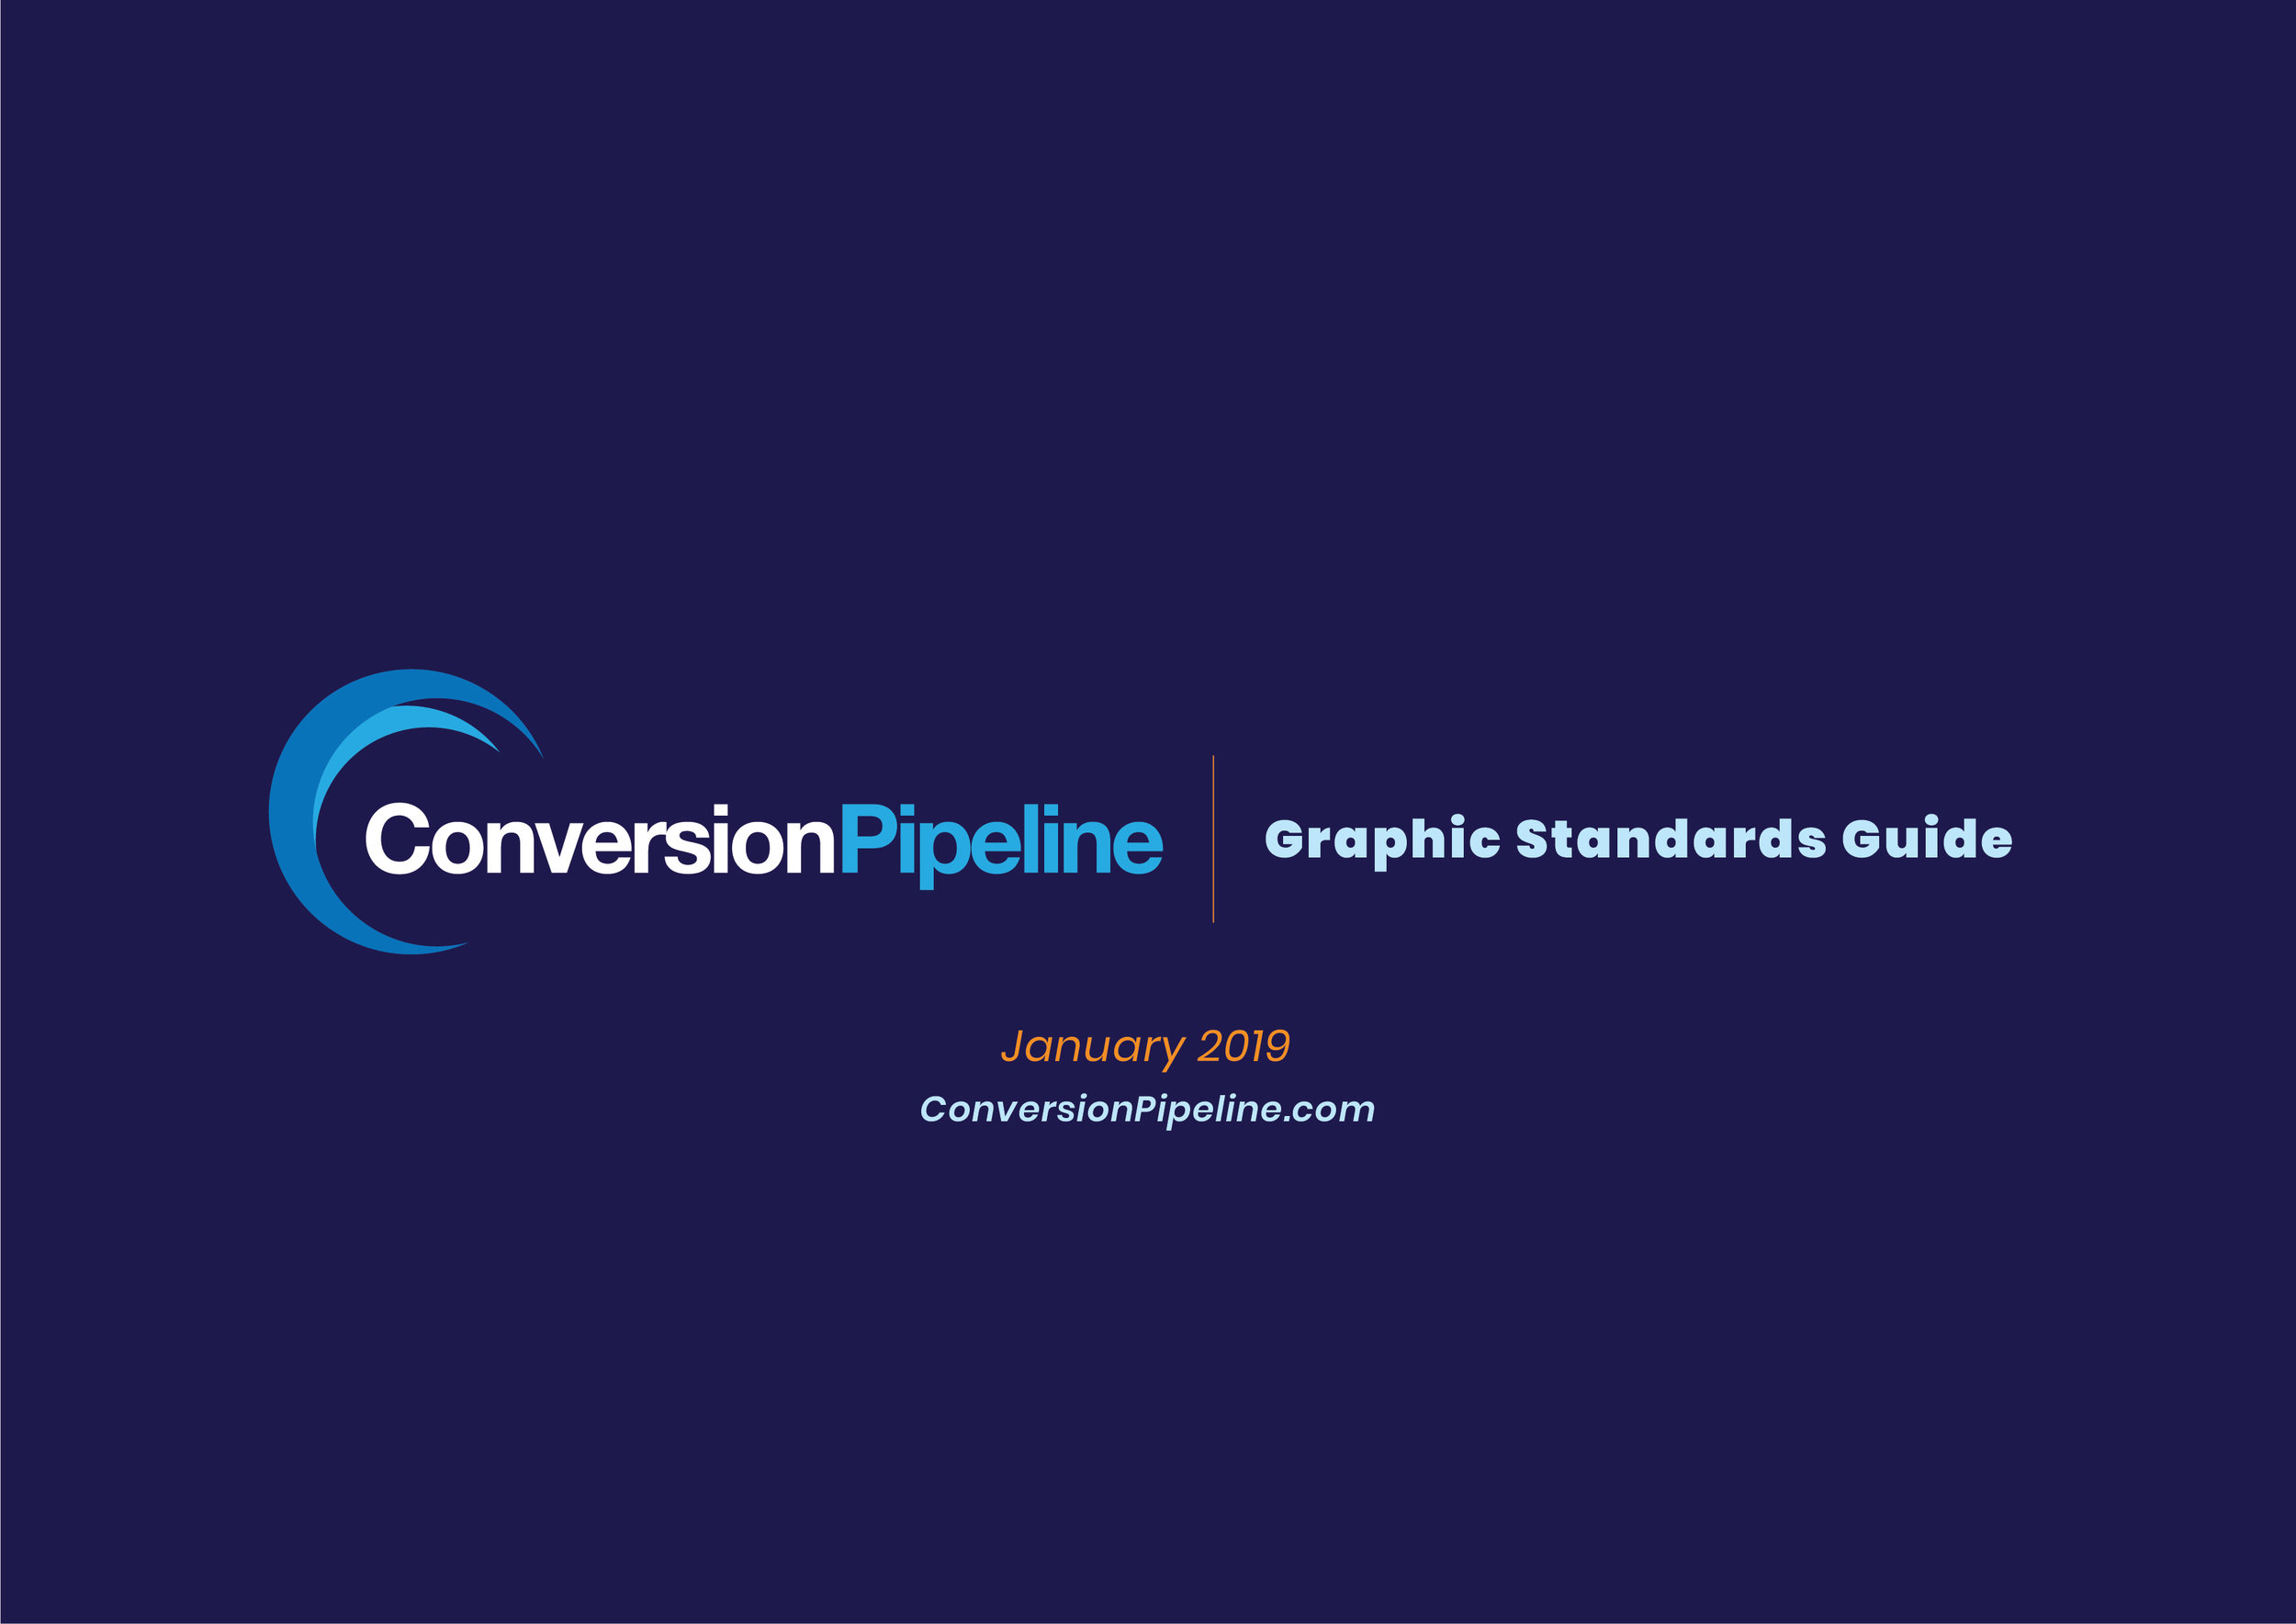 Conversion Pipeline 2019 Graphics Standard Guide-01.jpg